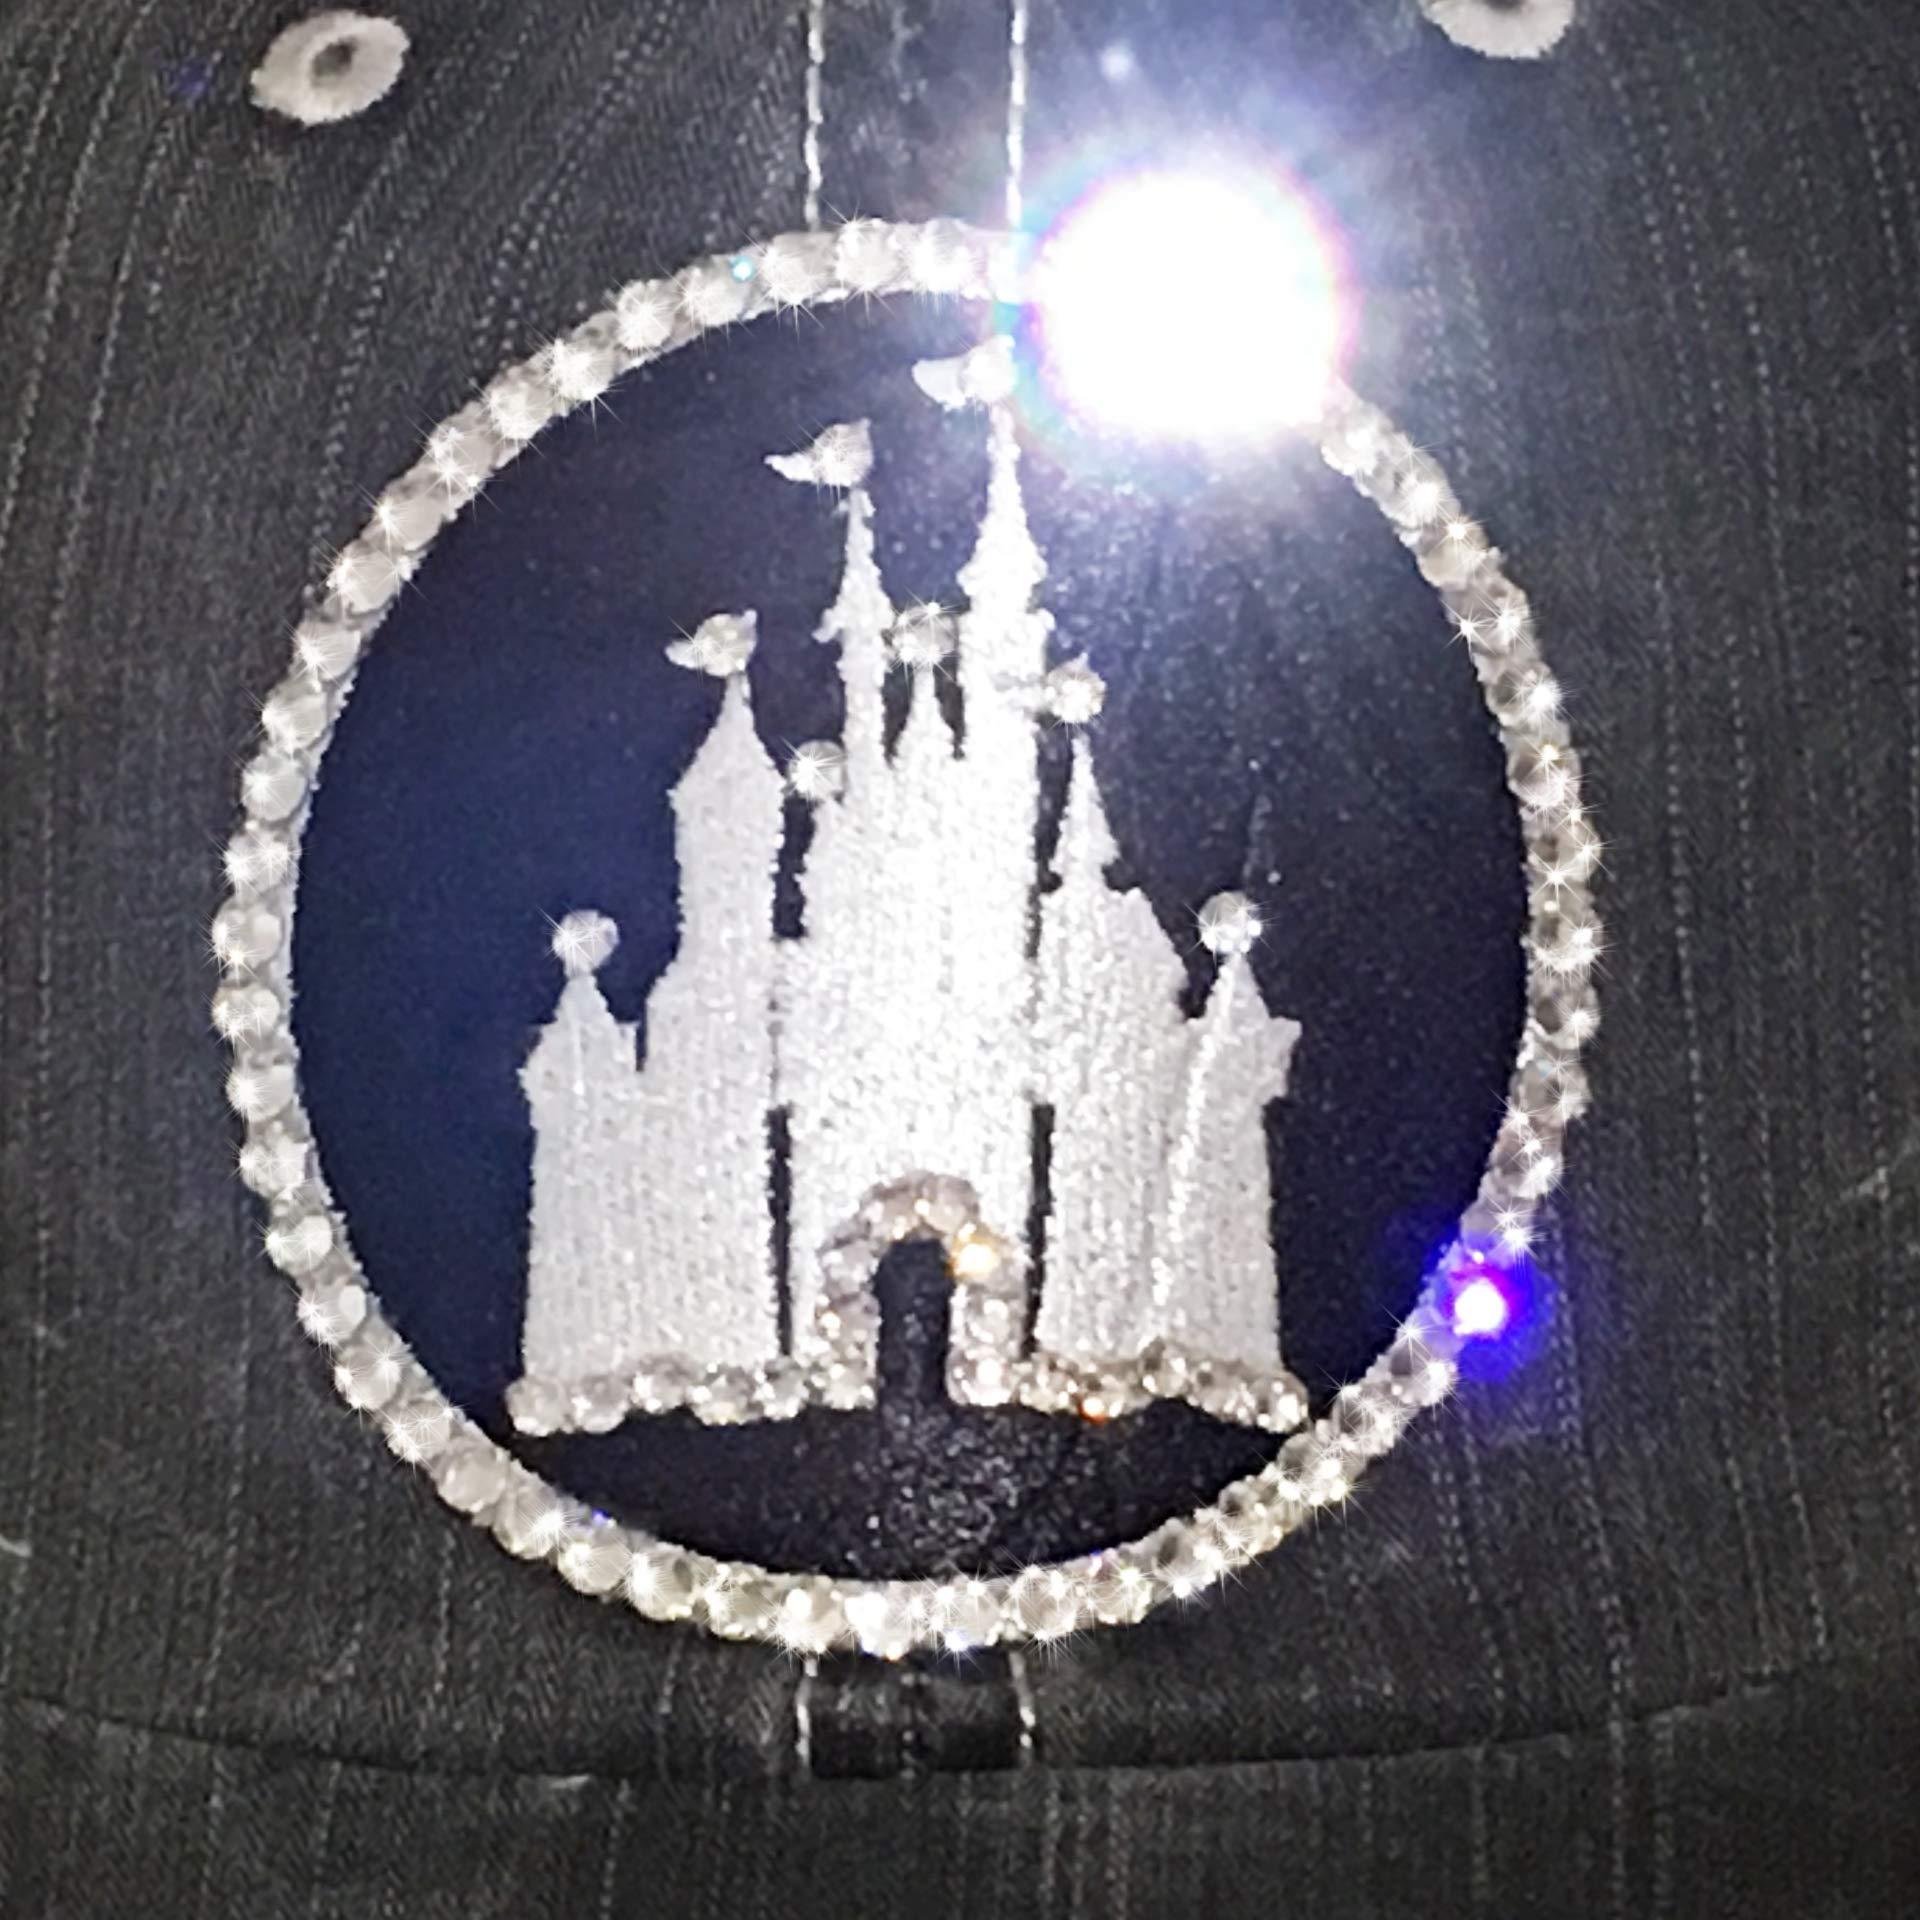 Disney High Ponytail Hat Bedazzled Mesh Baseball Cap Swarovski Crystal Bling Gray by Elivata (Image #4)